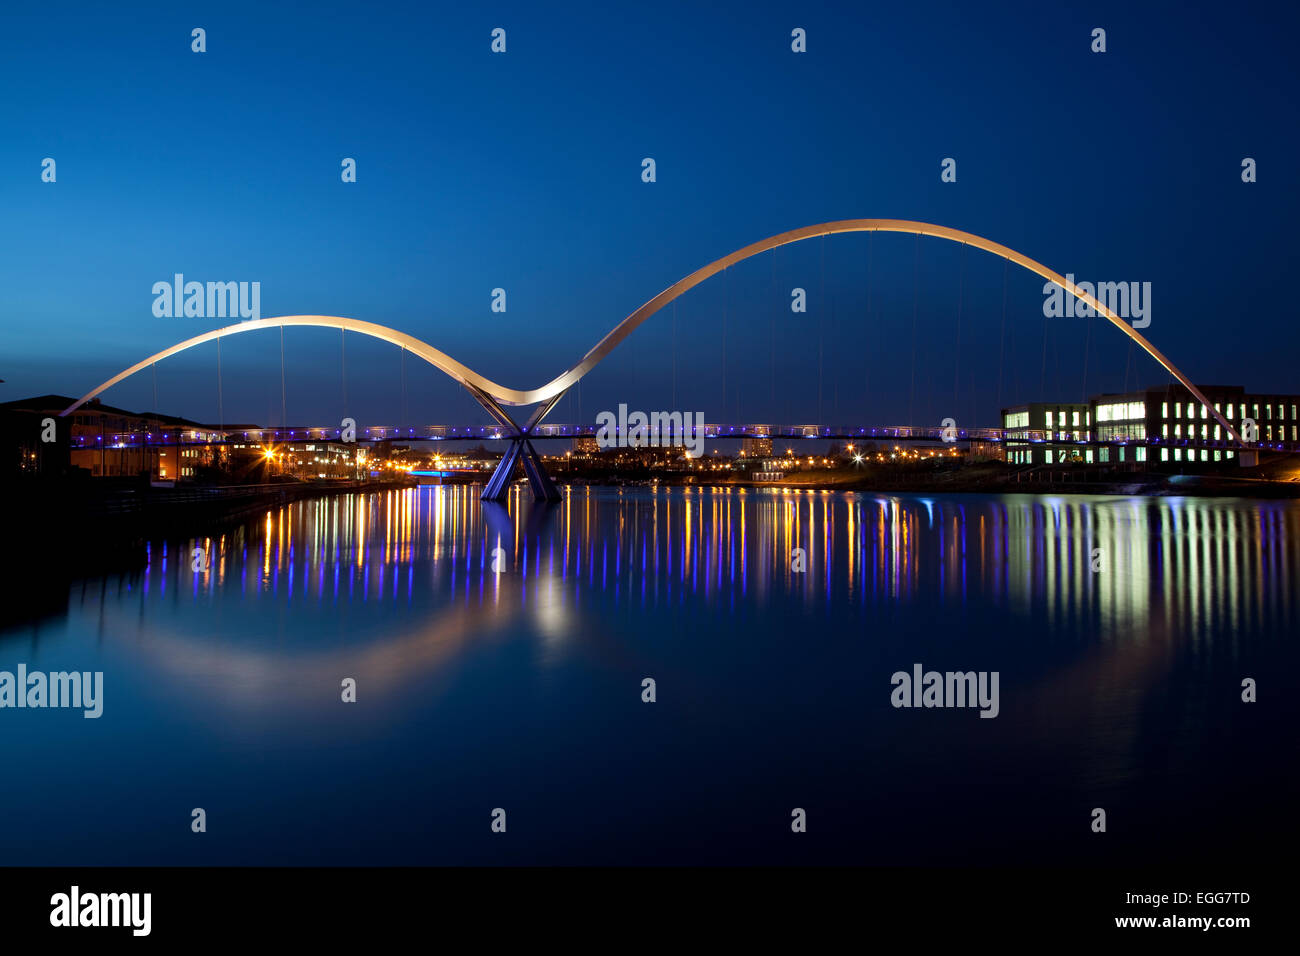 The Infinity Bridge at Stockton-on-Tees, England, at night Stock Photo